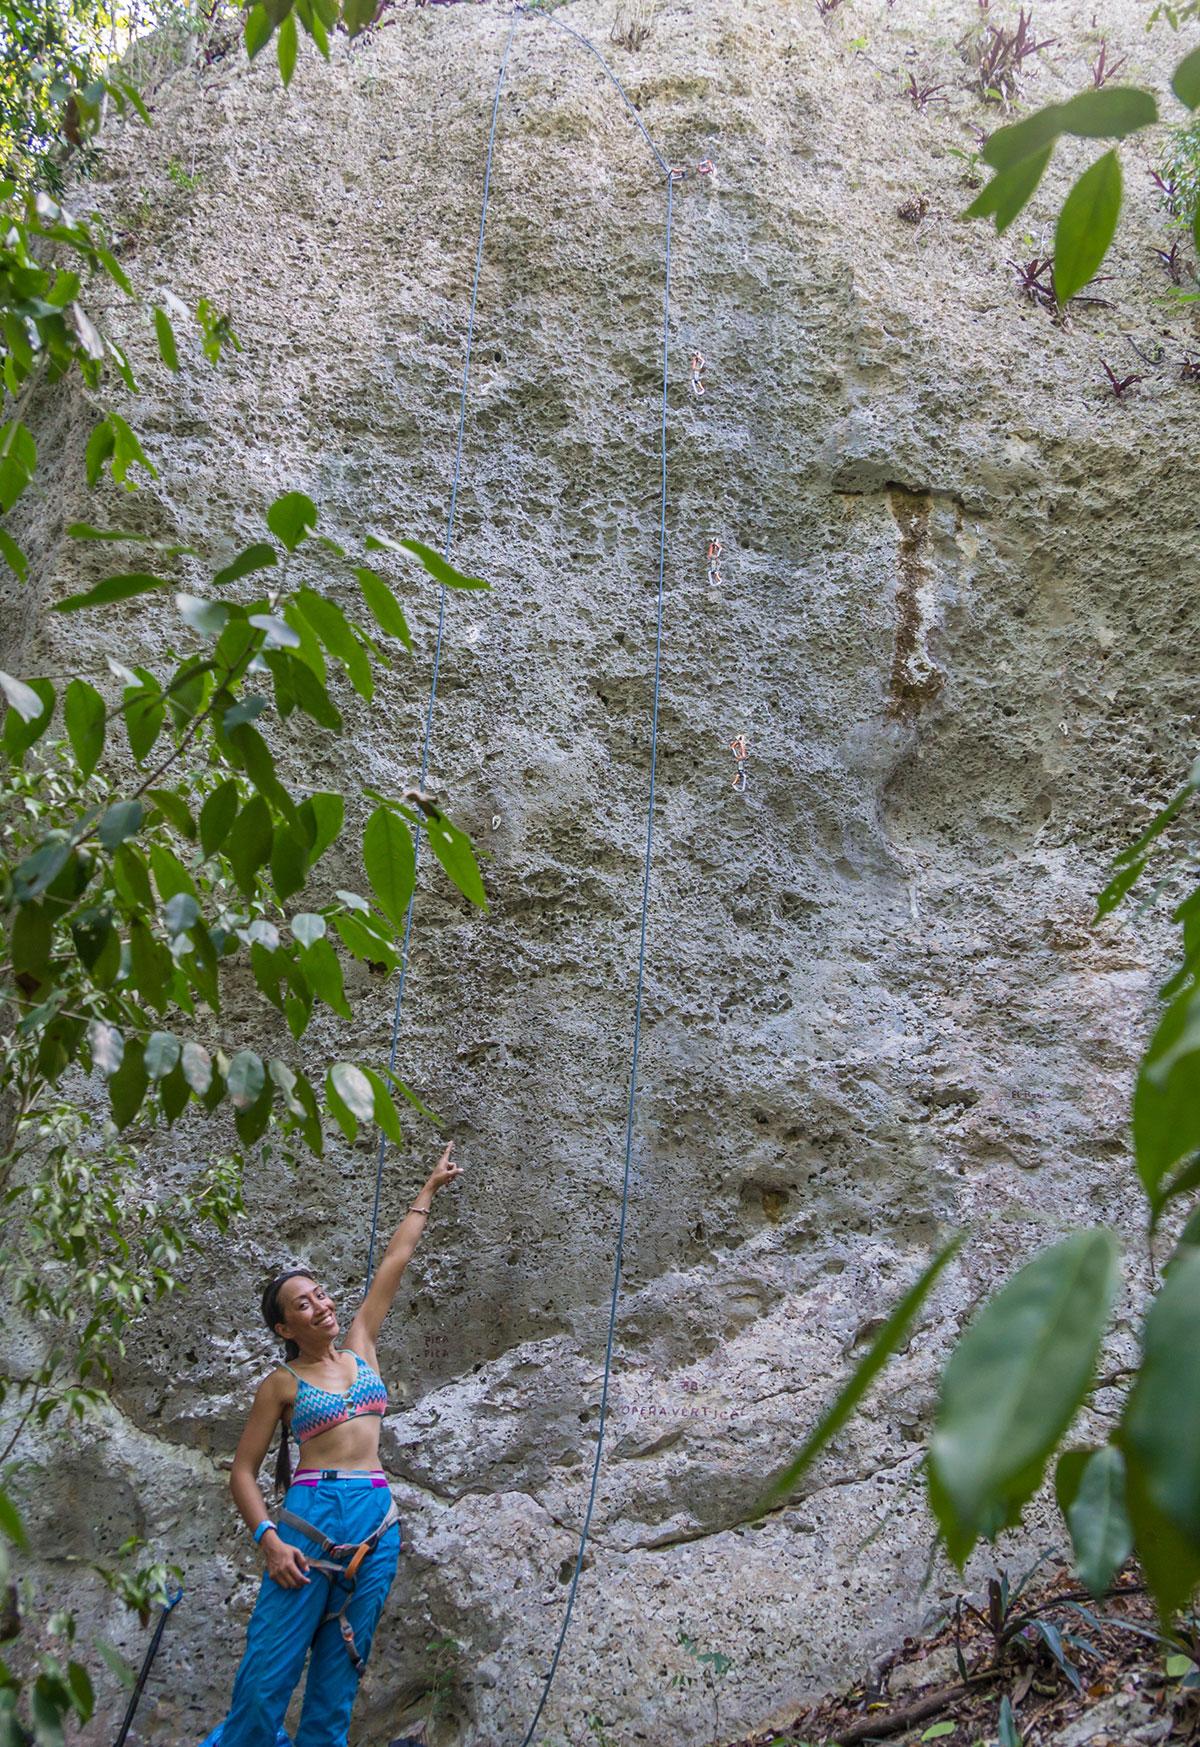 Dominikanische Republik, Felsen von Bayahibe, Route